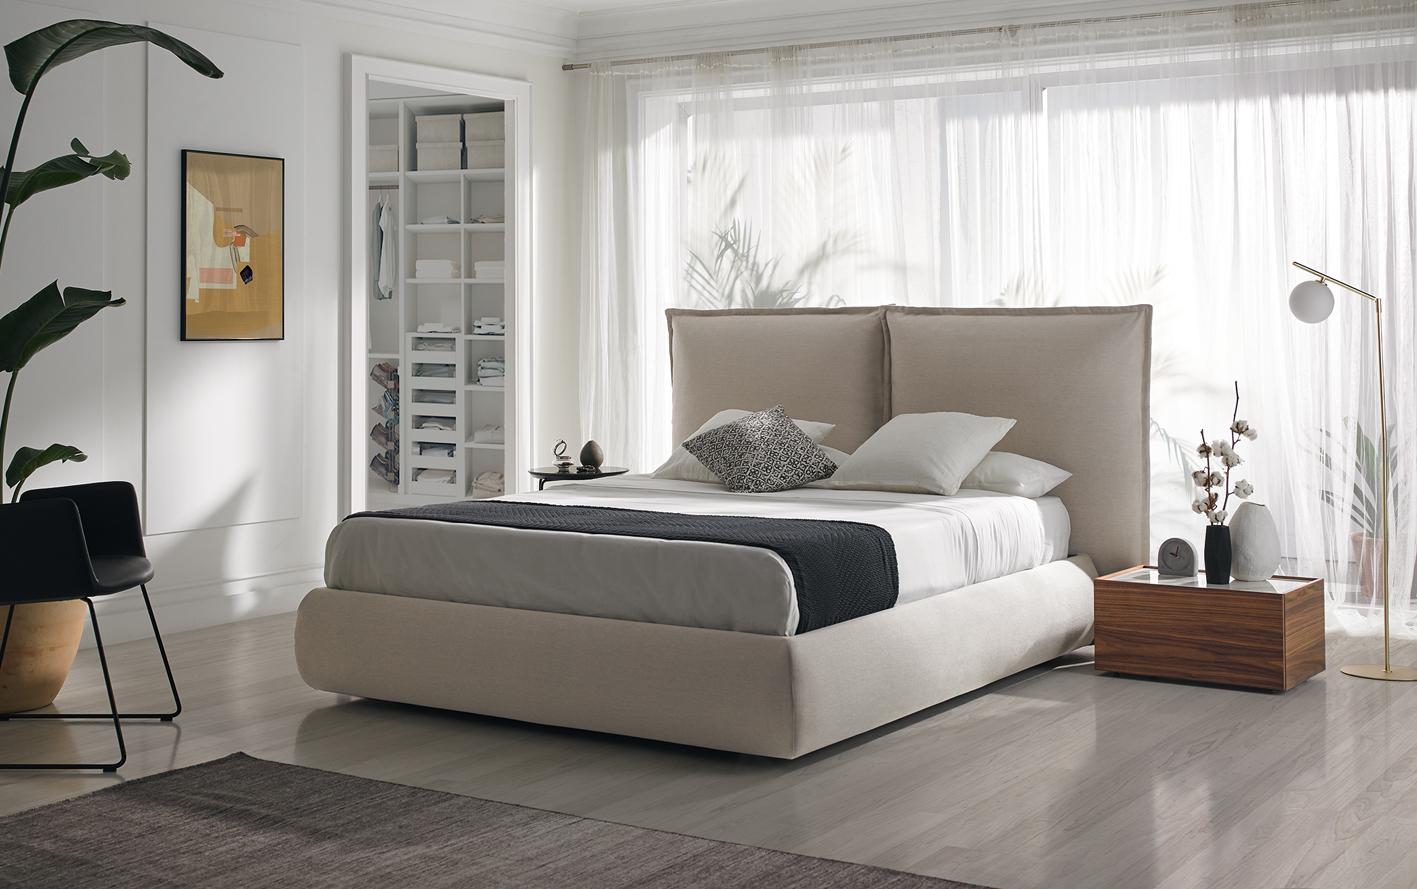 dormitorio-moderno-mobenia03